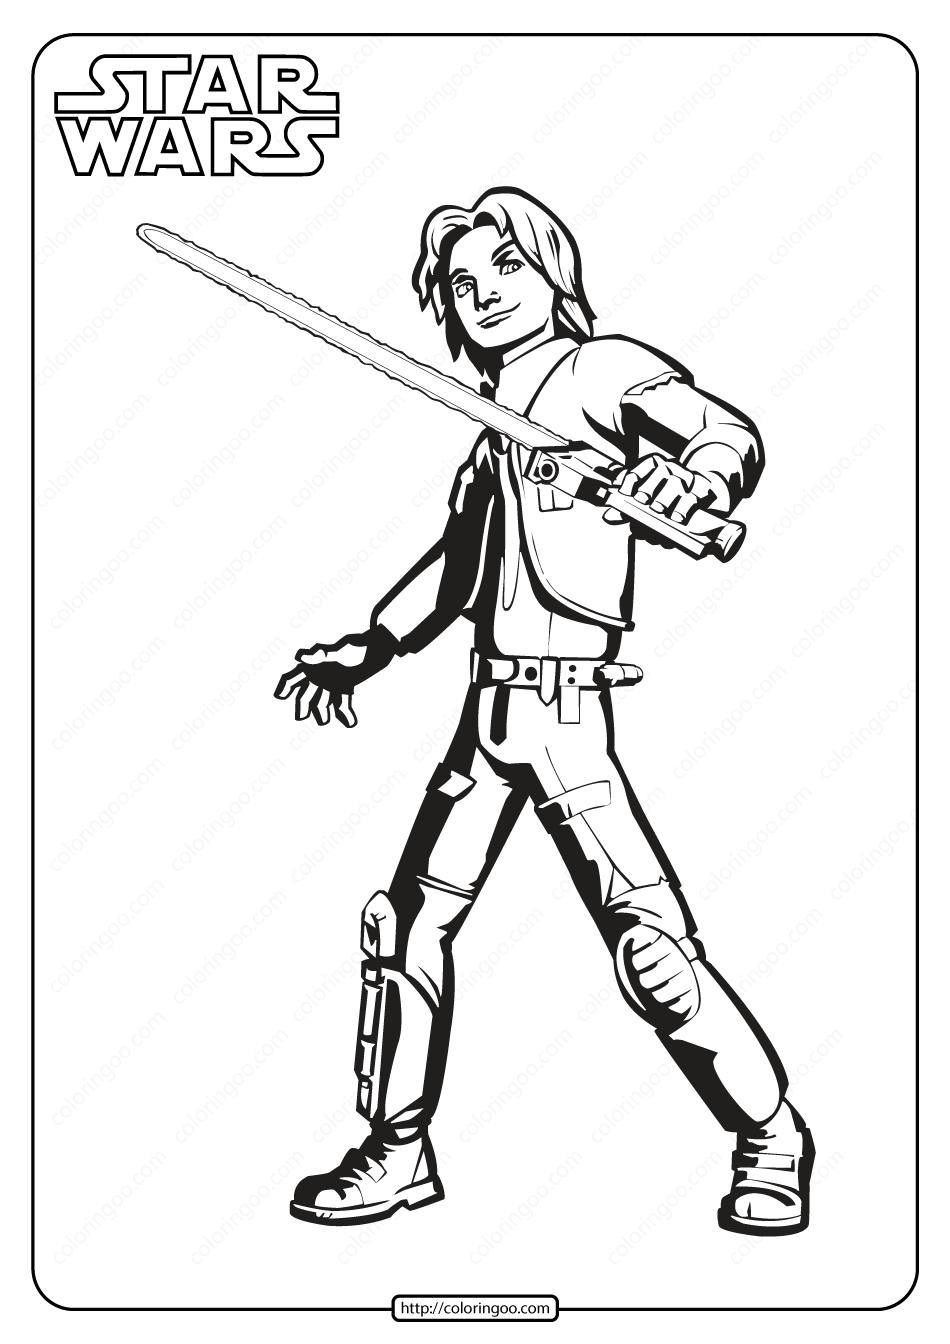 Printable Star Wars Ezra Bridger Coloring Pages  Star wars ezra